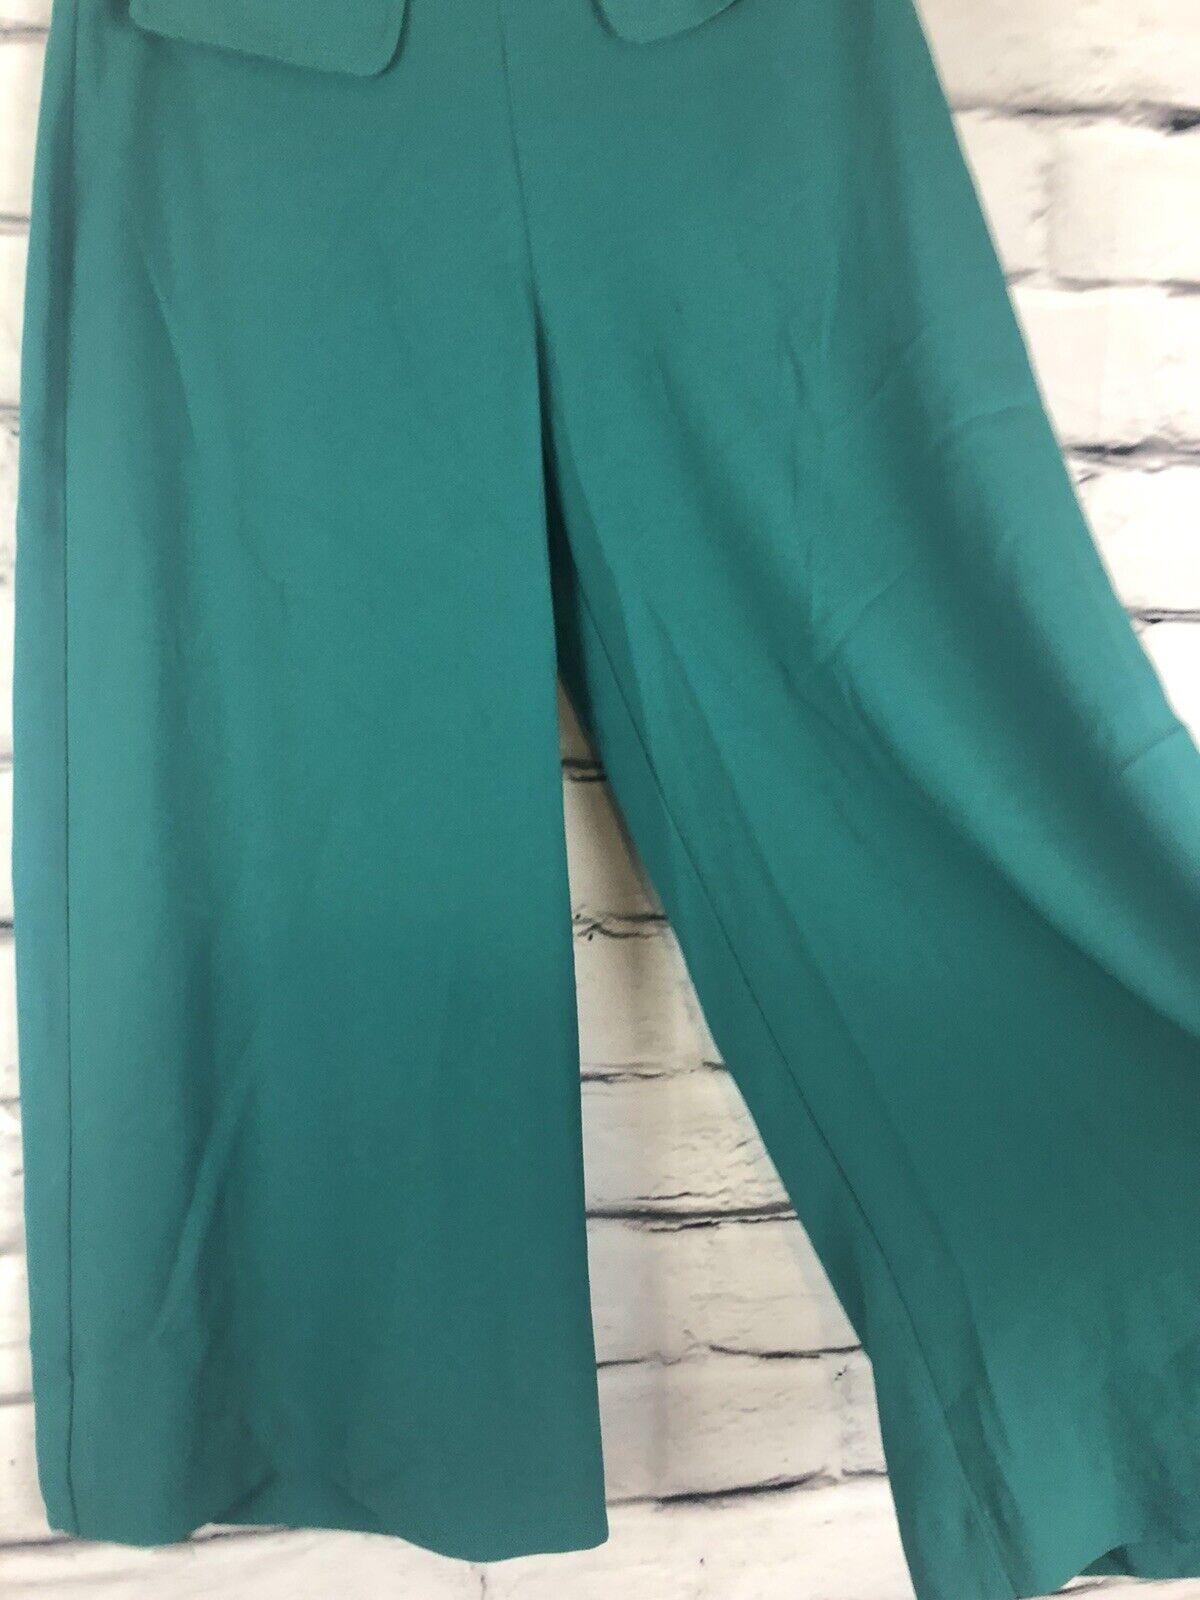 Trina Turk Womens Teal Size 12 Gaucho Pants  - image 3